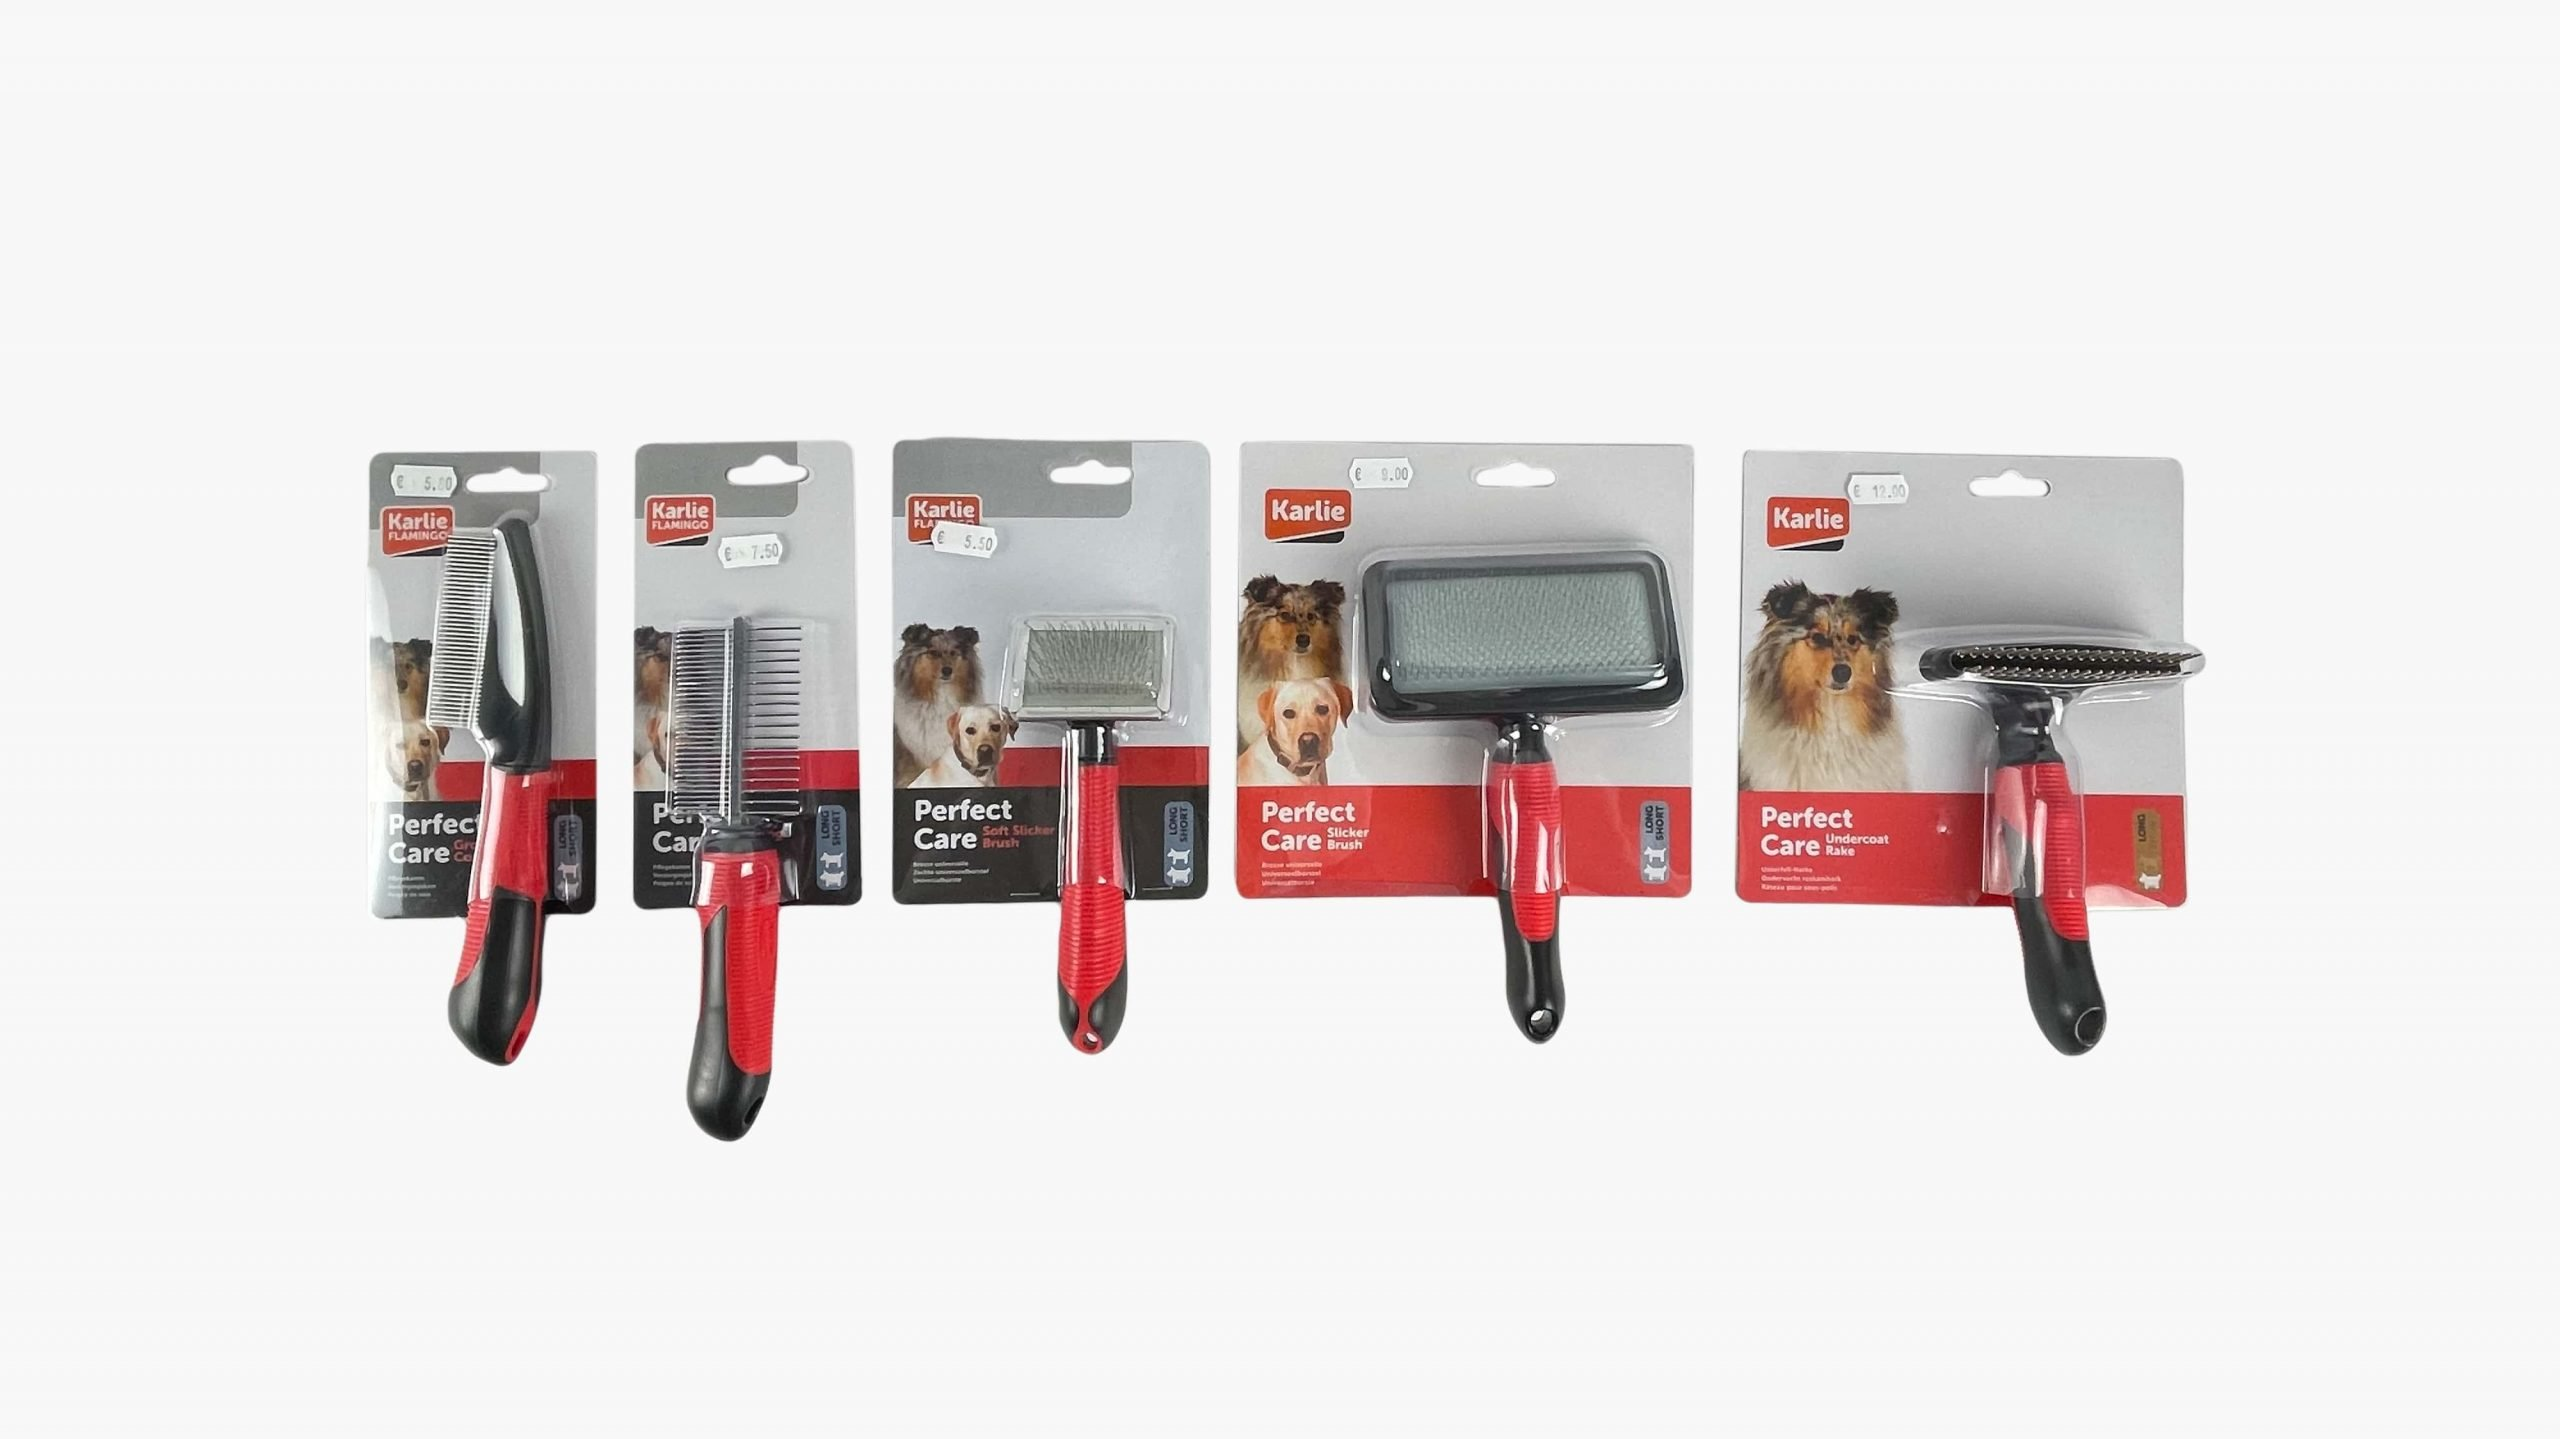 petpoint-dog care-karlie